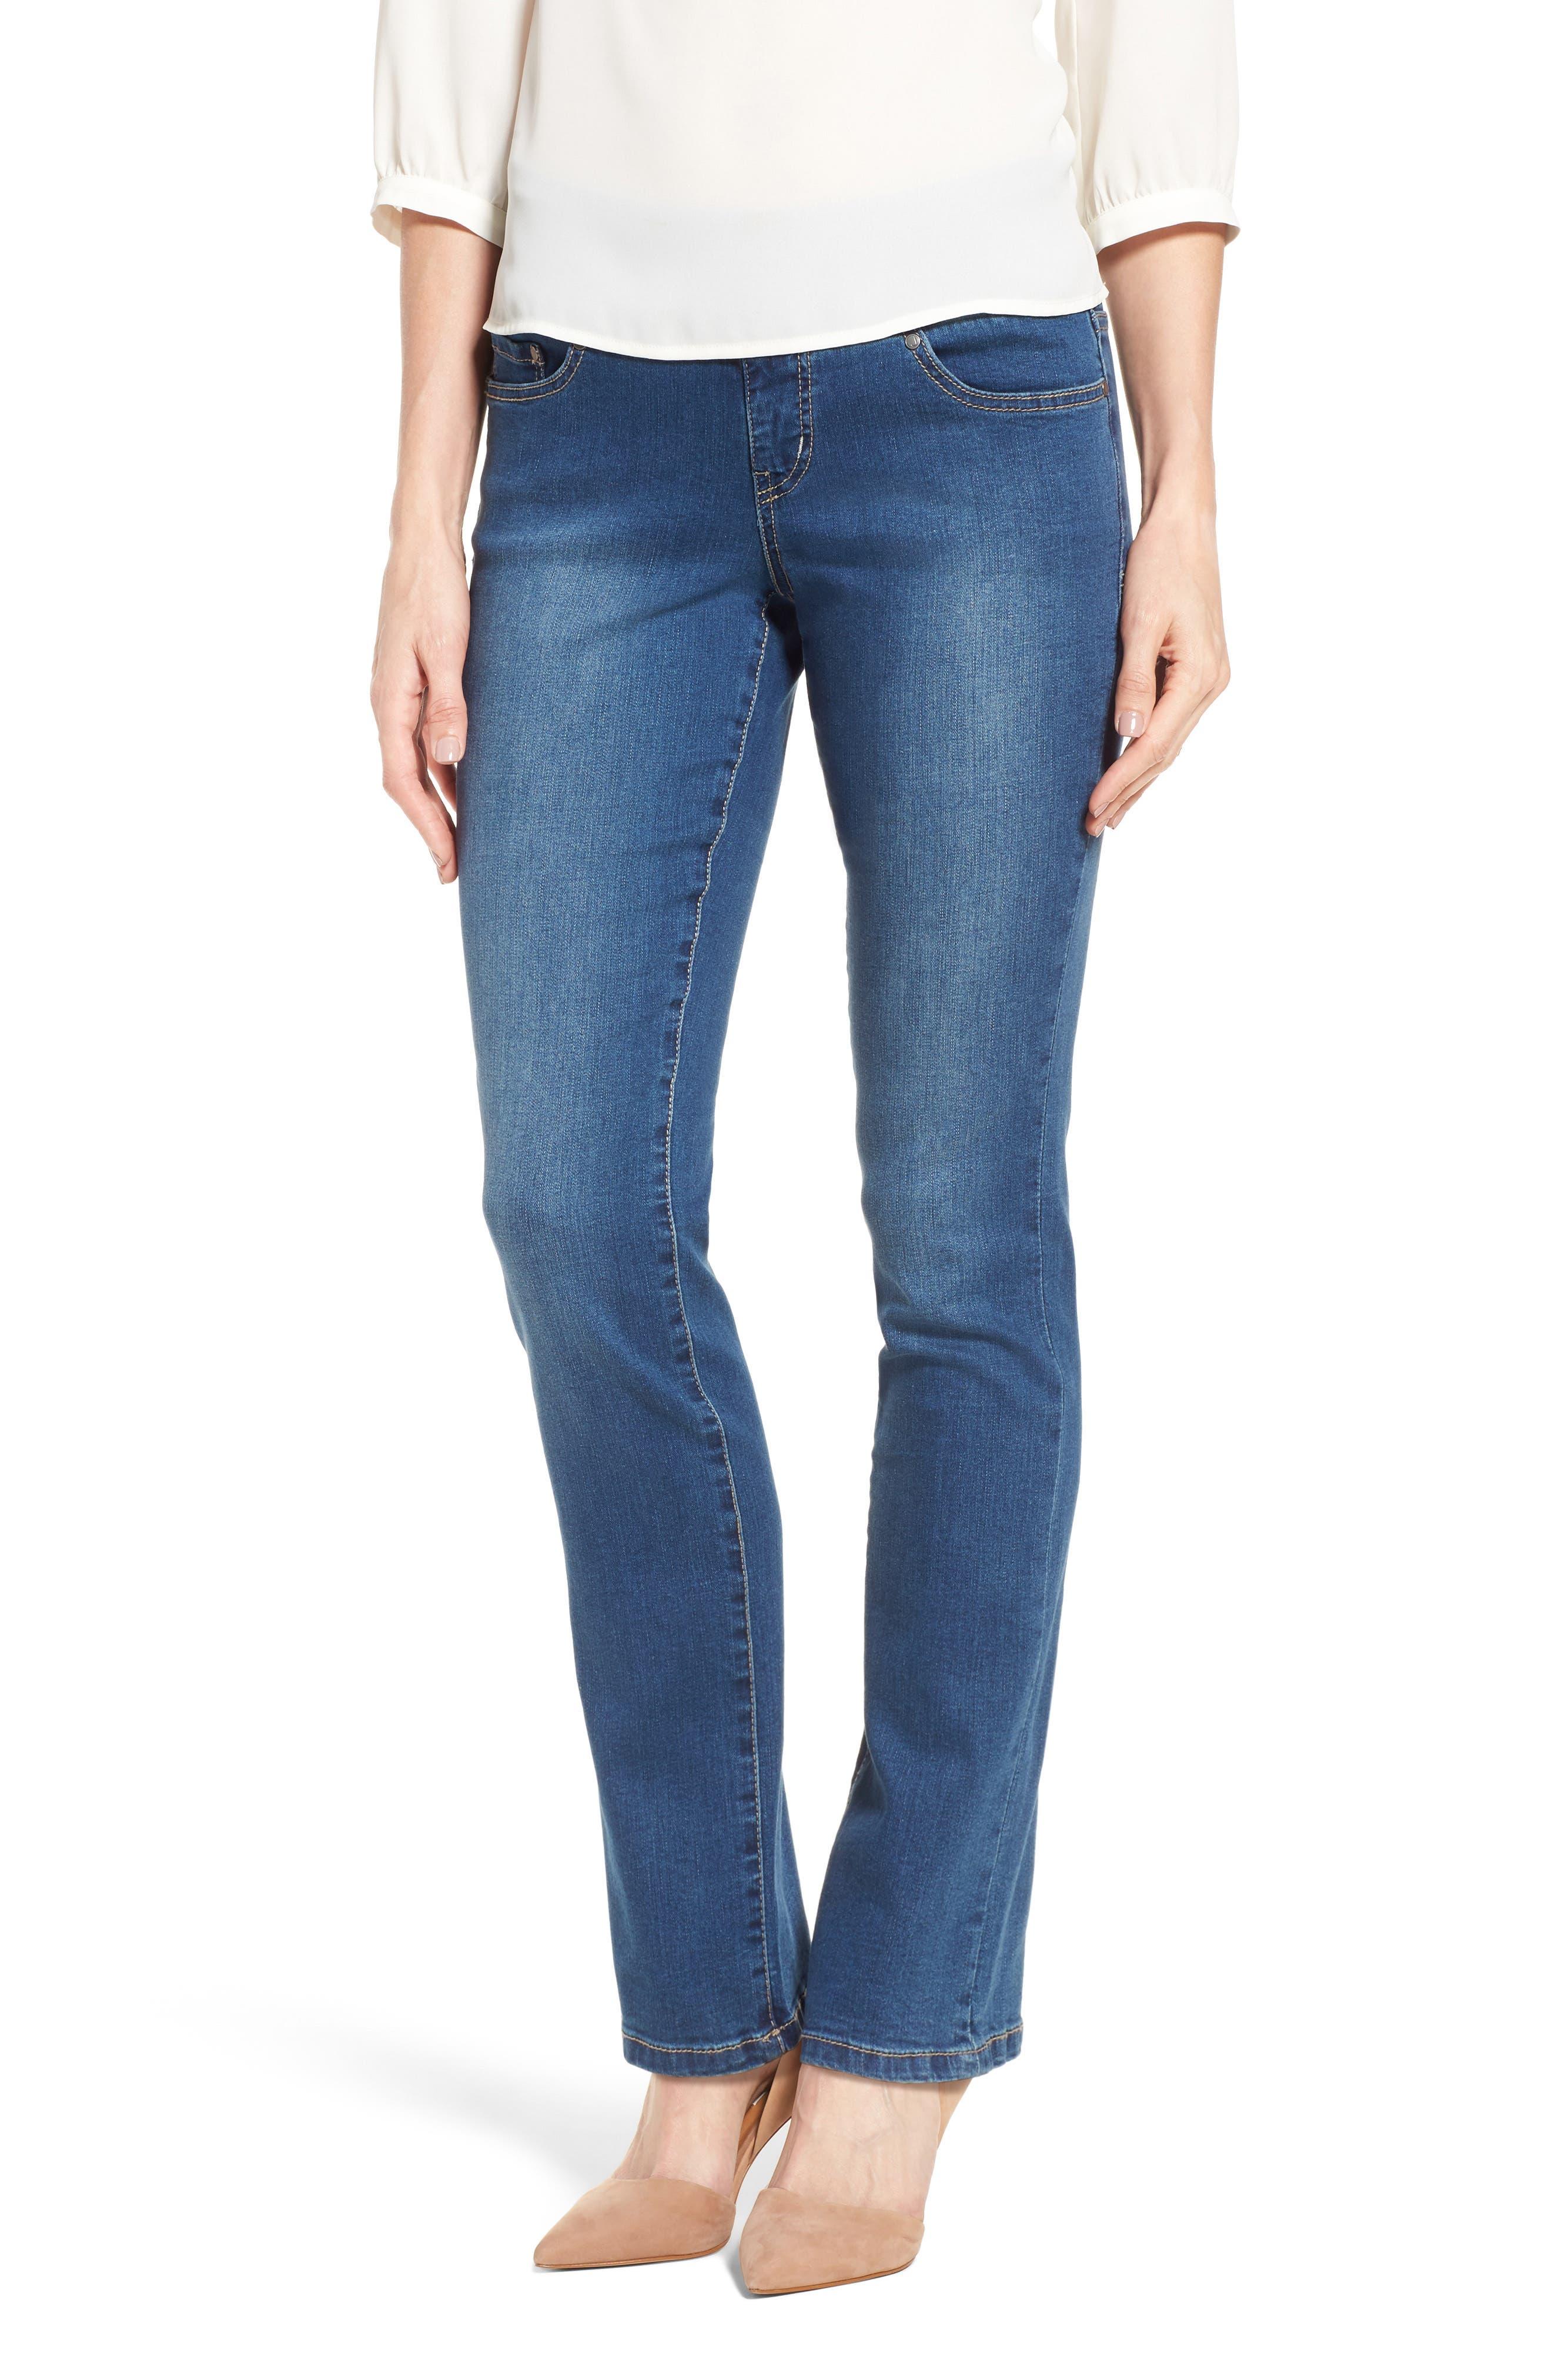 Peri Pull-On Straight Leg Jeans,                         Main,                         color, Medium Indigo